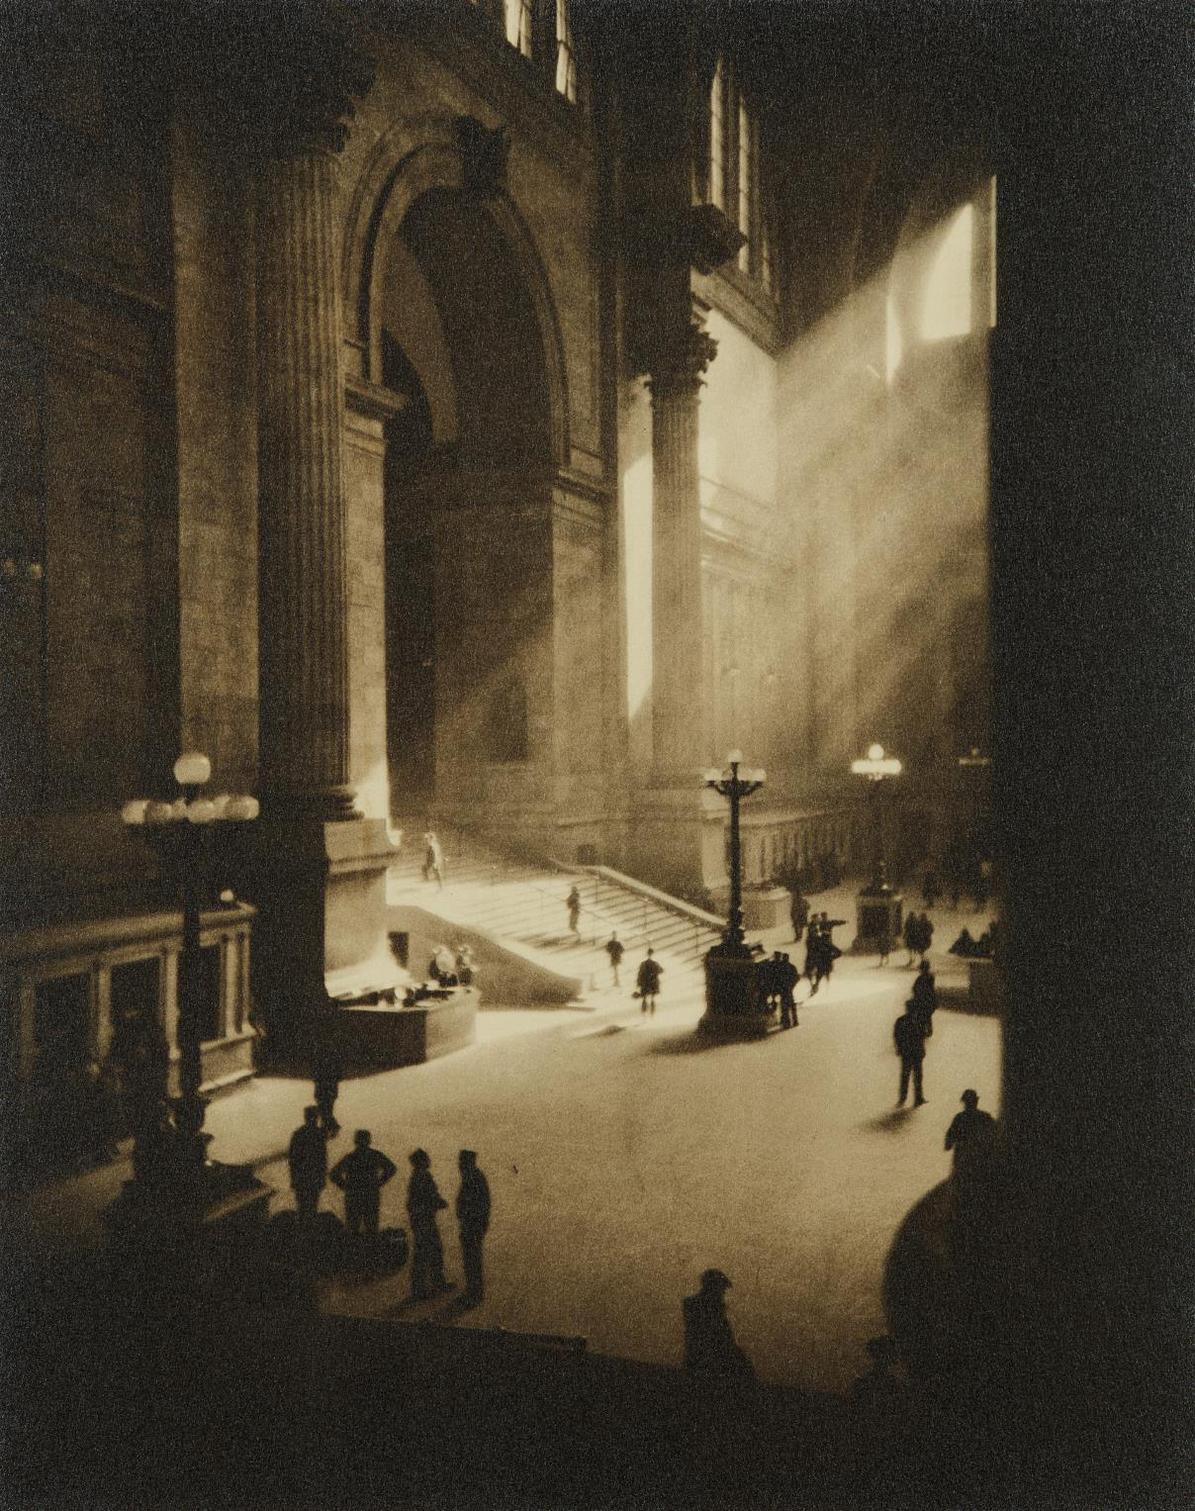 Drahomir Josef Ruzicka-Penn Station, New York-1919